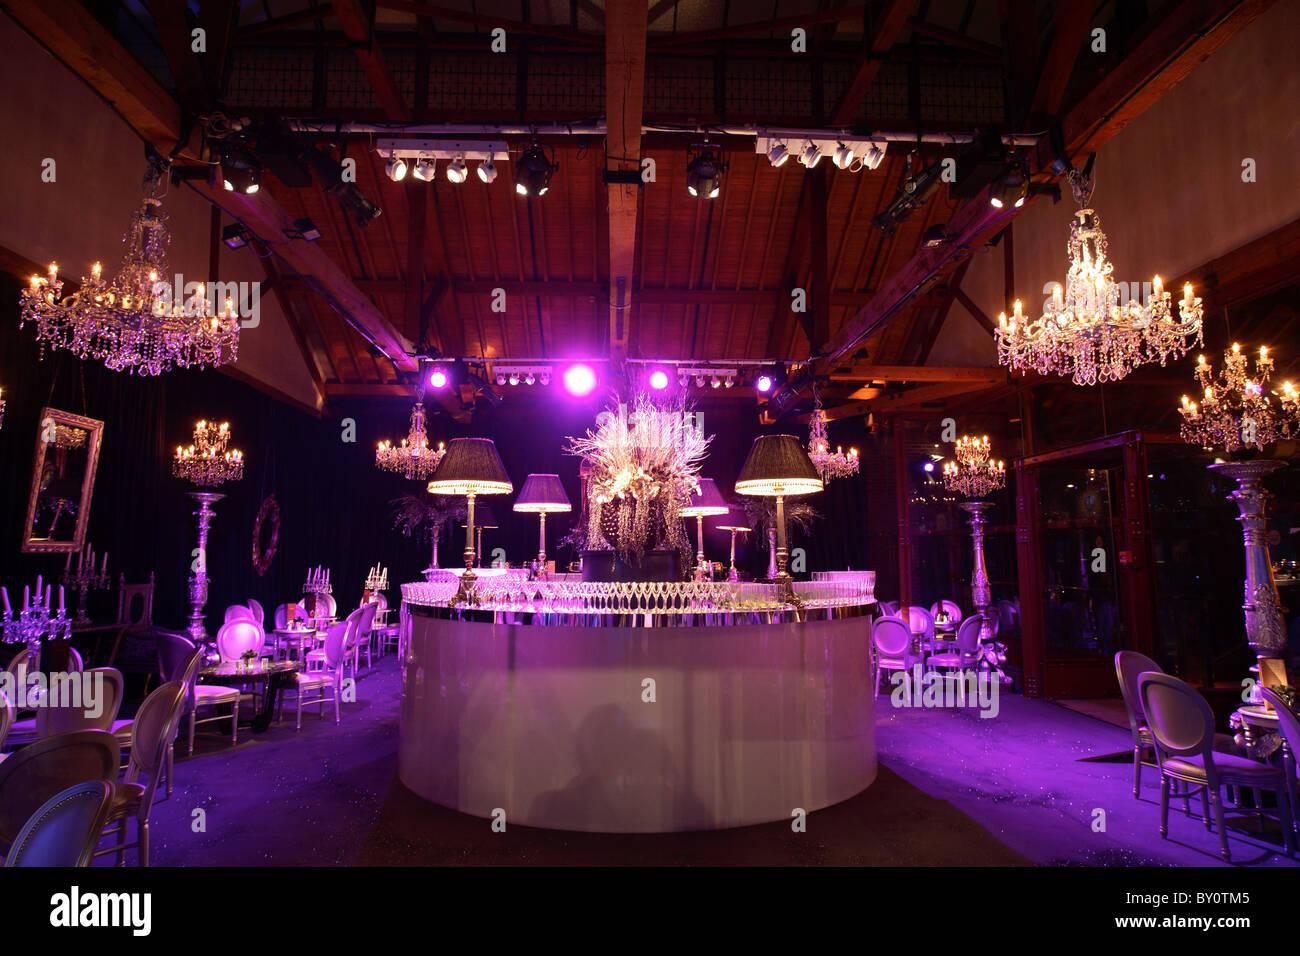 glamorous bar club interior - Stock Image